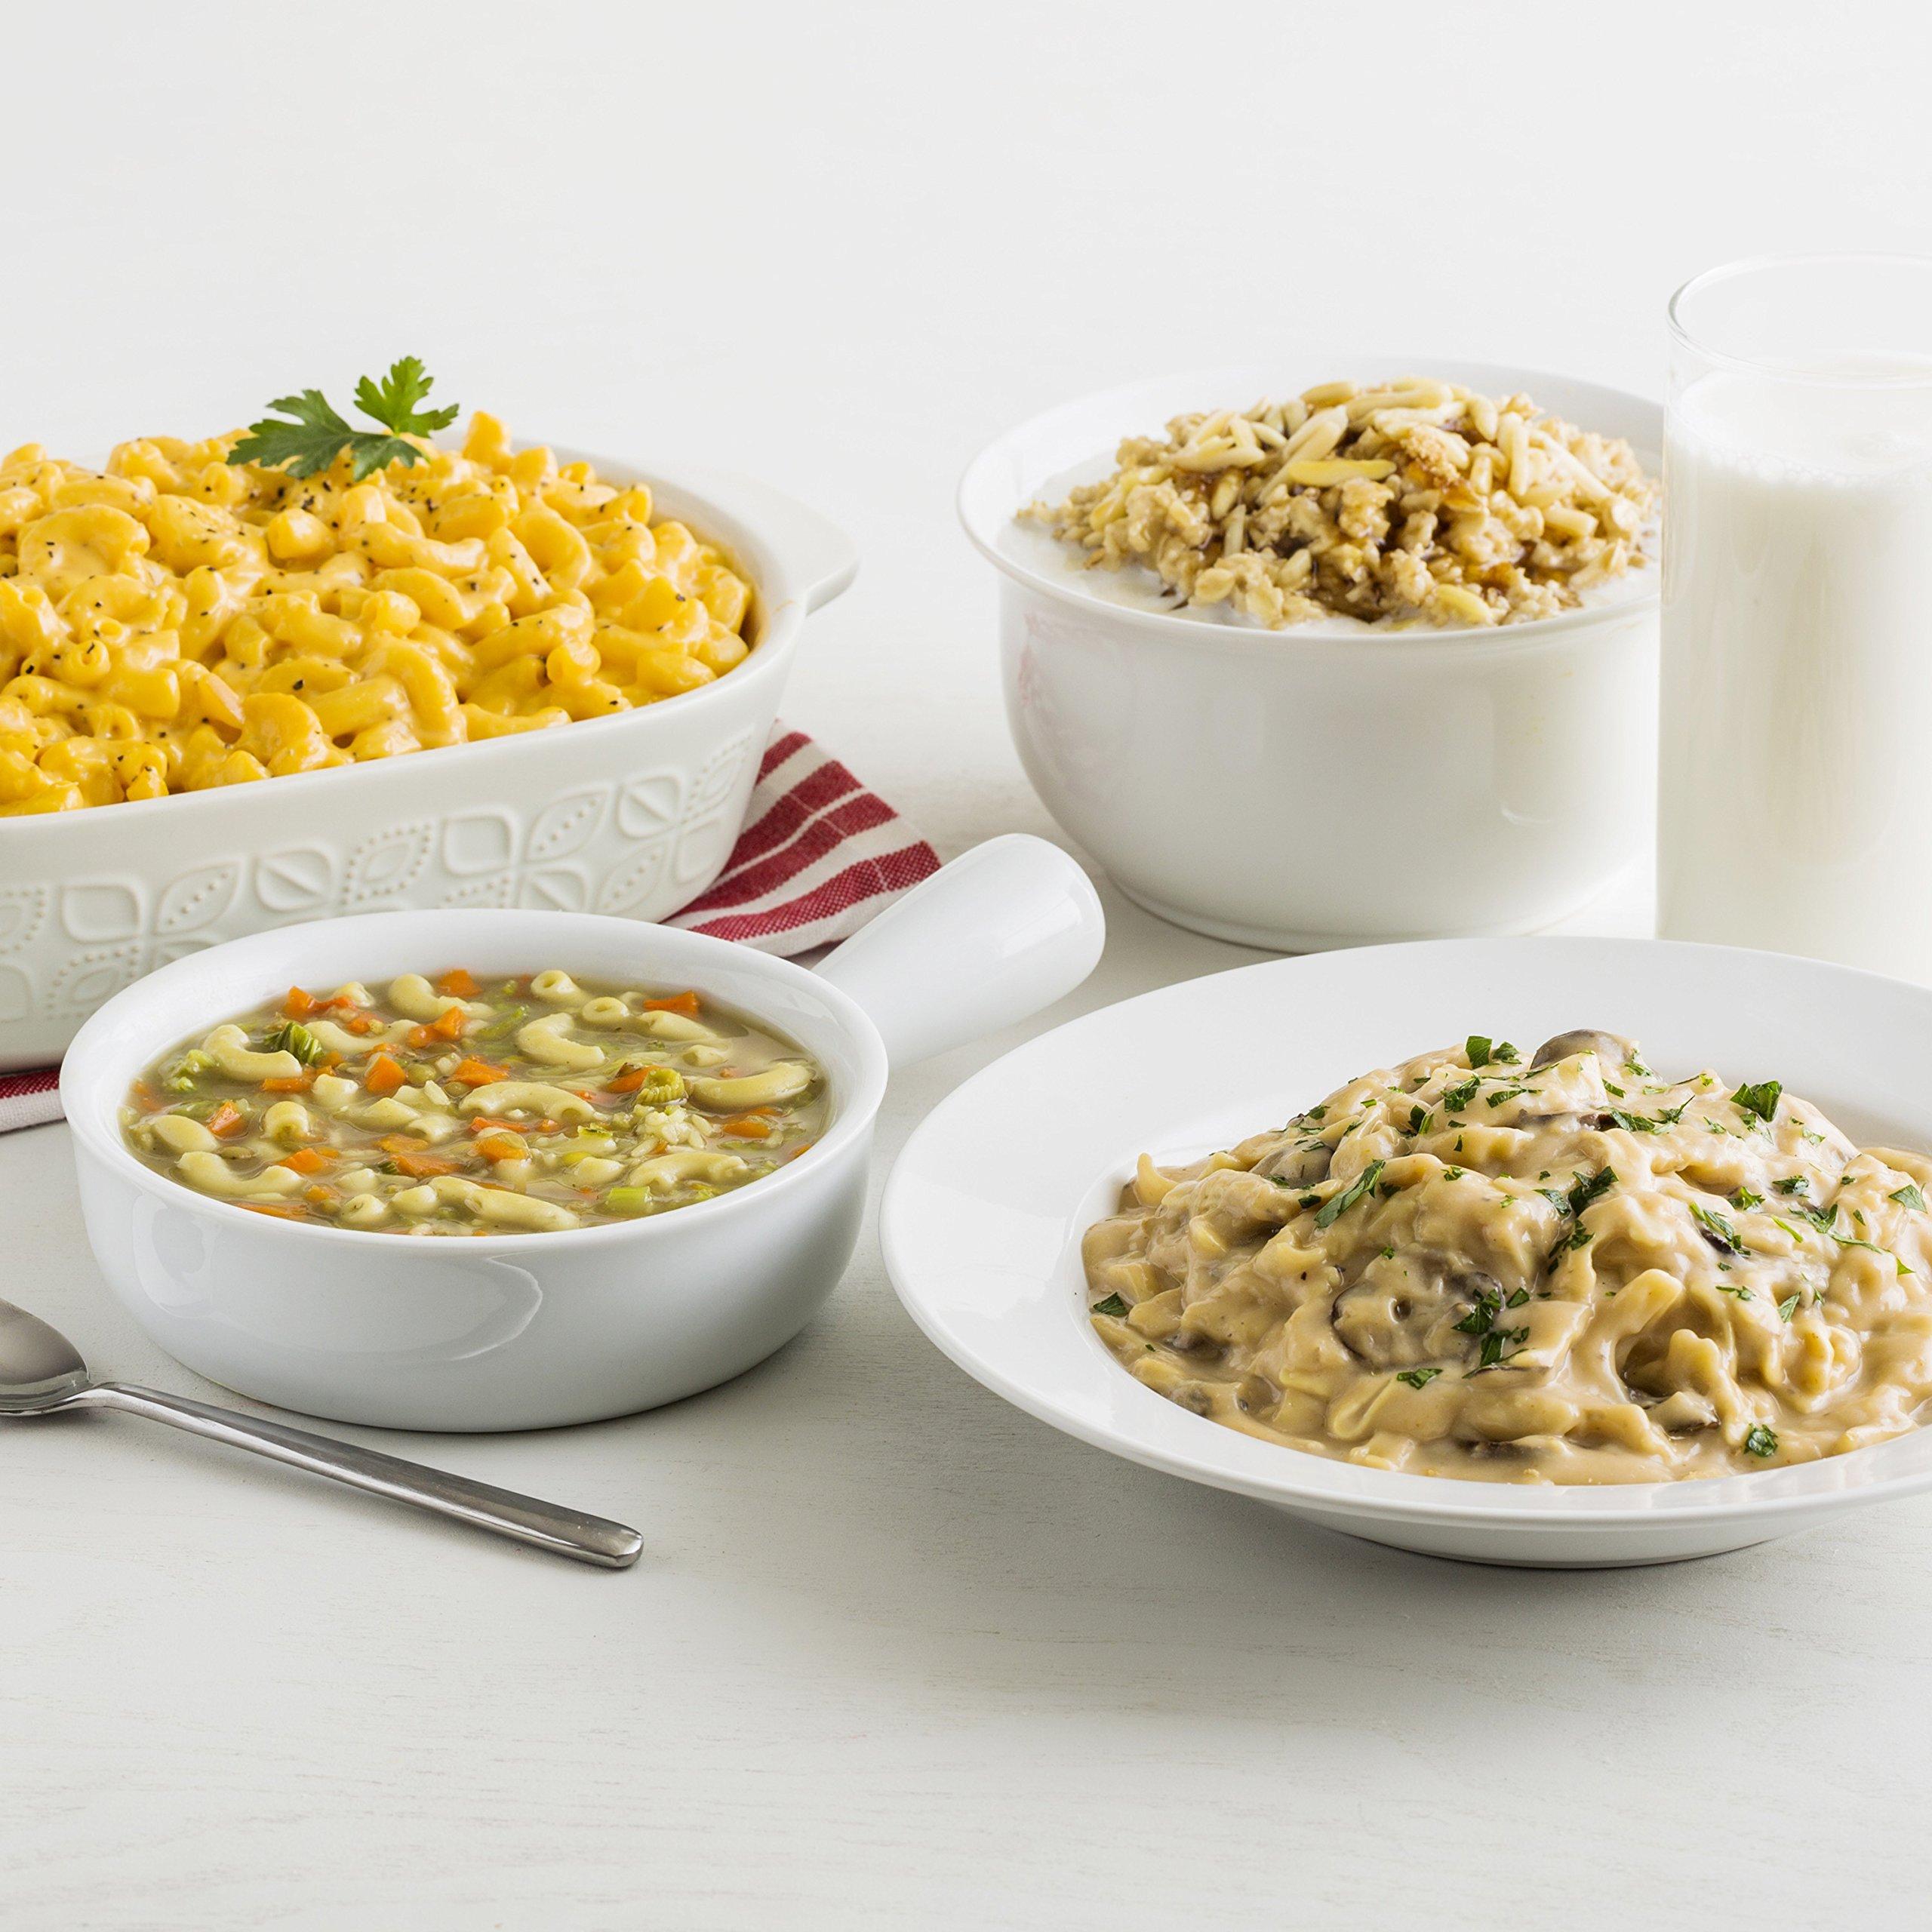 Augason Farms Breakfast & Dinner Variety Emergency Food Supply 7 lbs 5.21 oz 4 Gallon Pail by Augason Farms (Image #4)